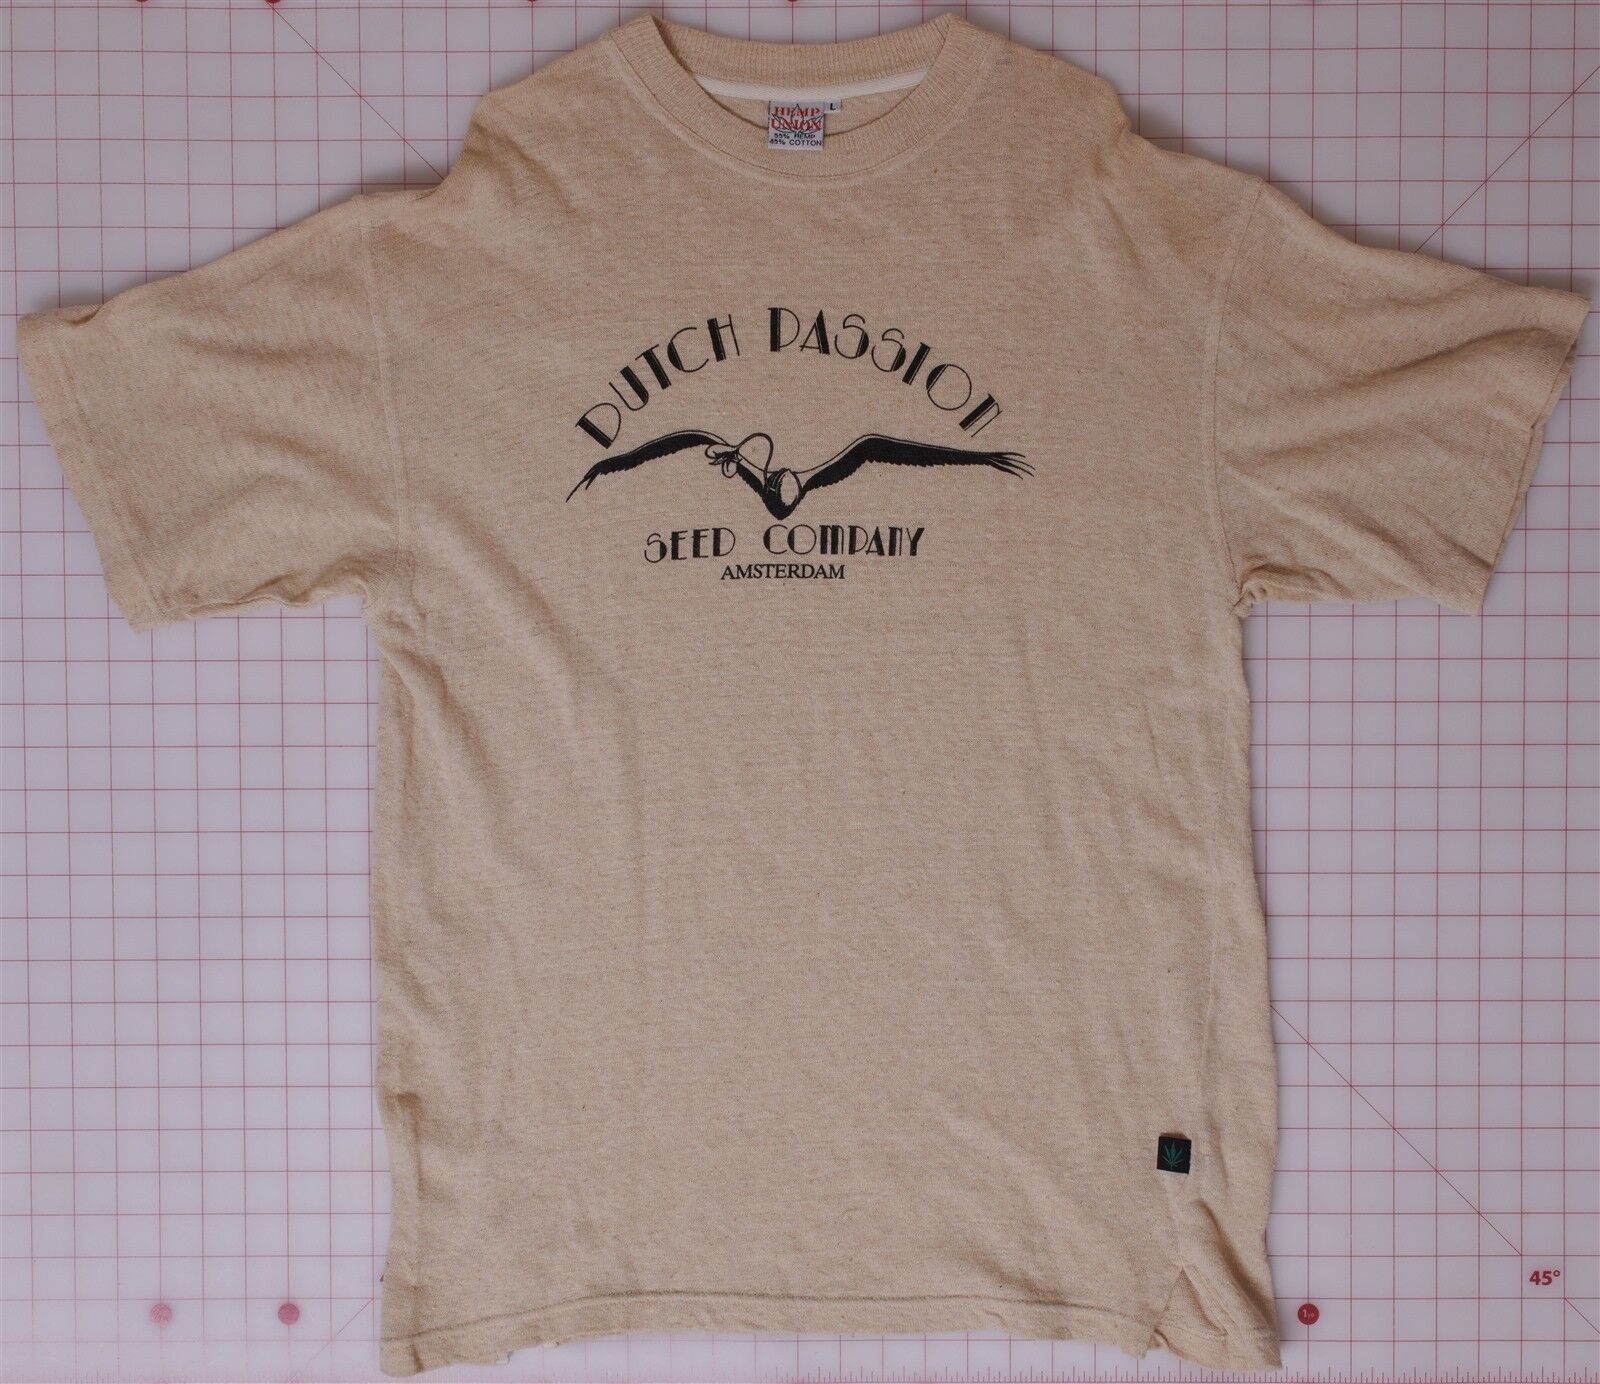 Dutch Passion Seed Co. Large Hemp Tan T-Shirt